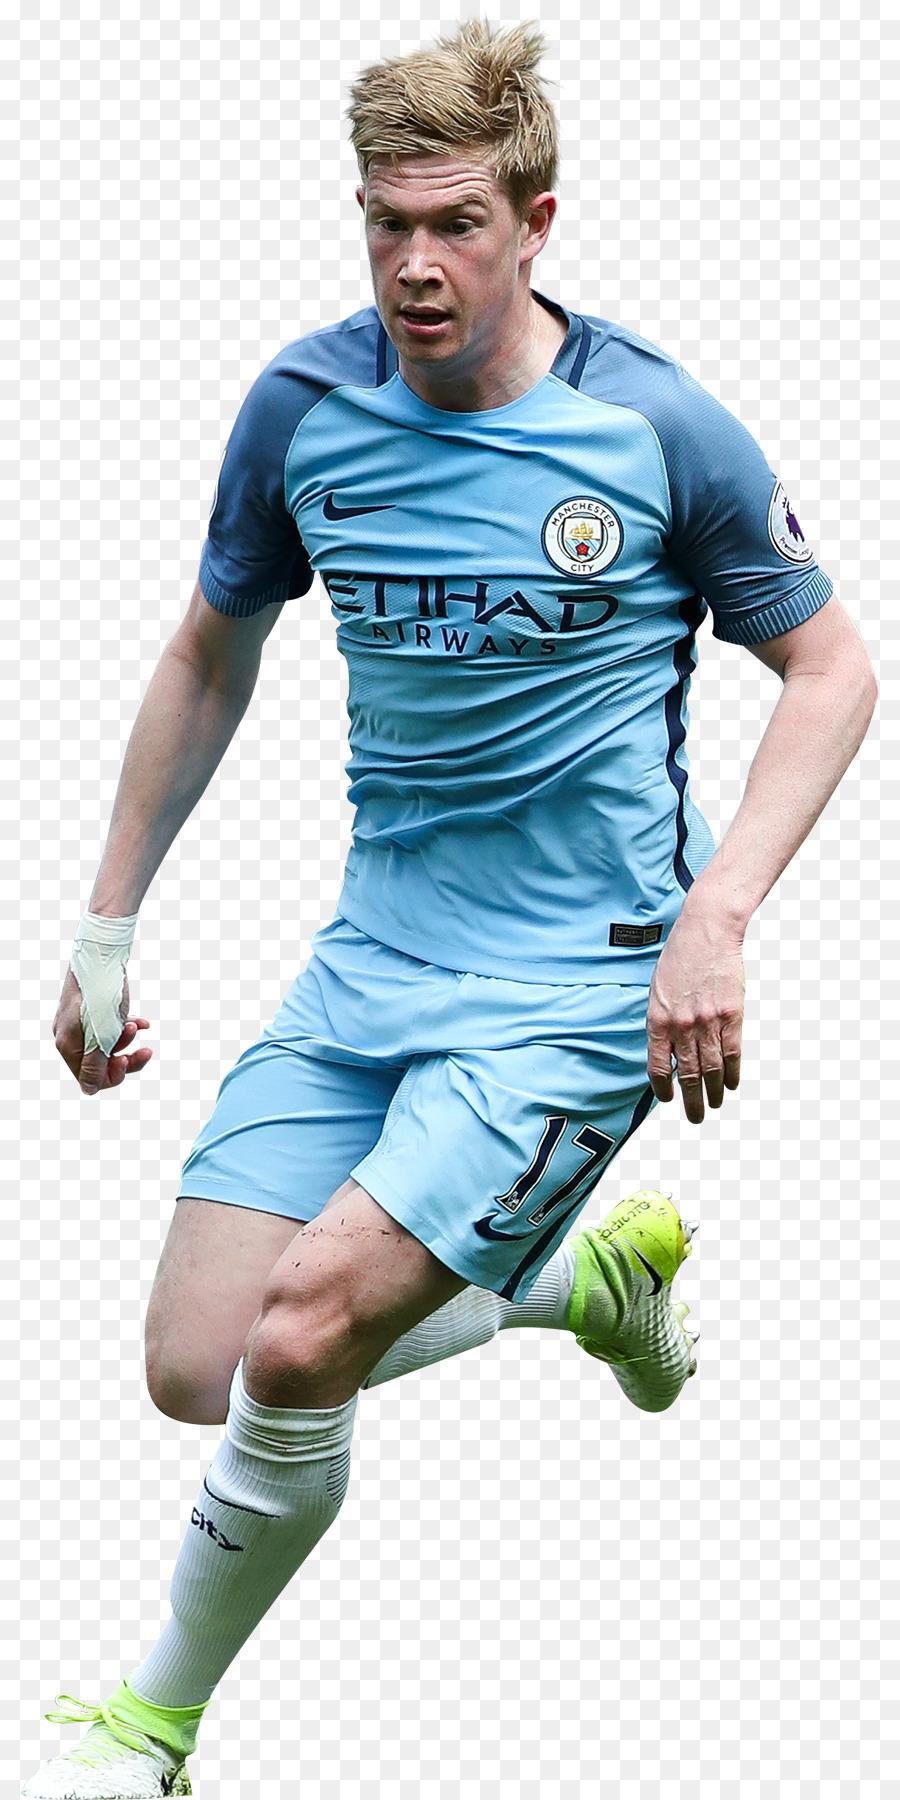 b59b0f158 Kevin De Bruyne Manchester City F.C. Belgium national football team ...